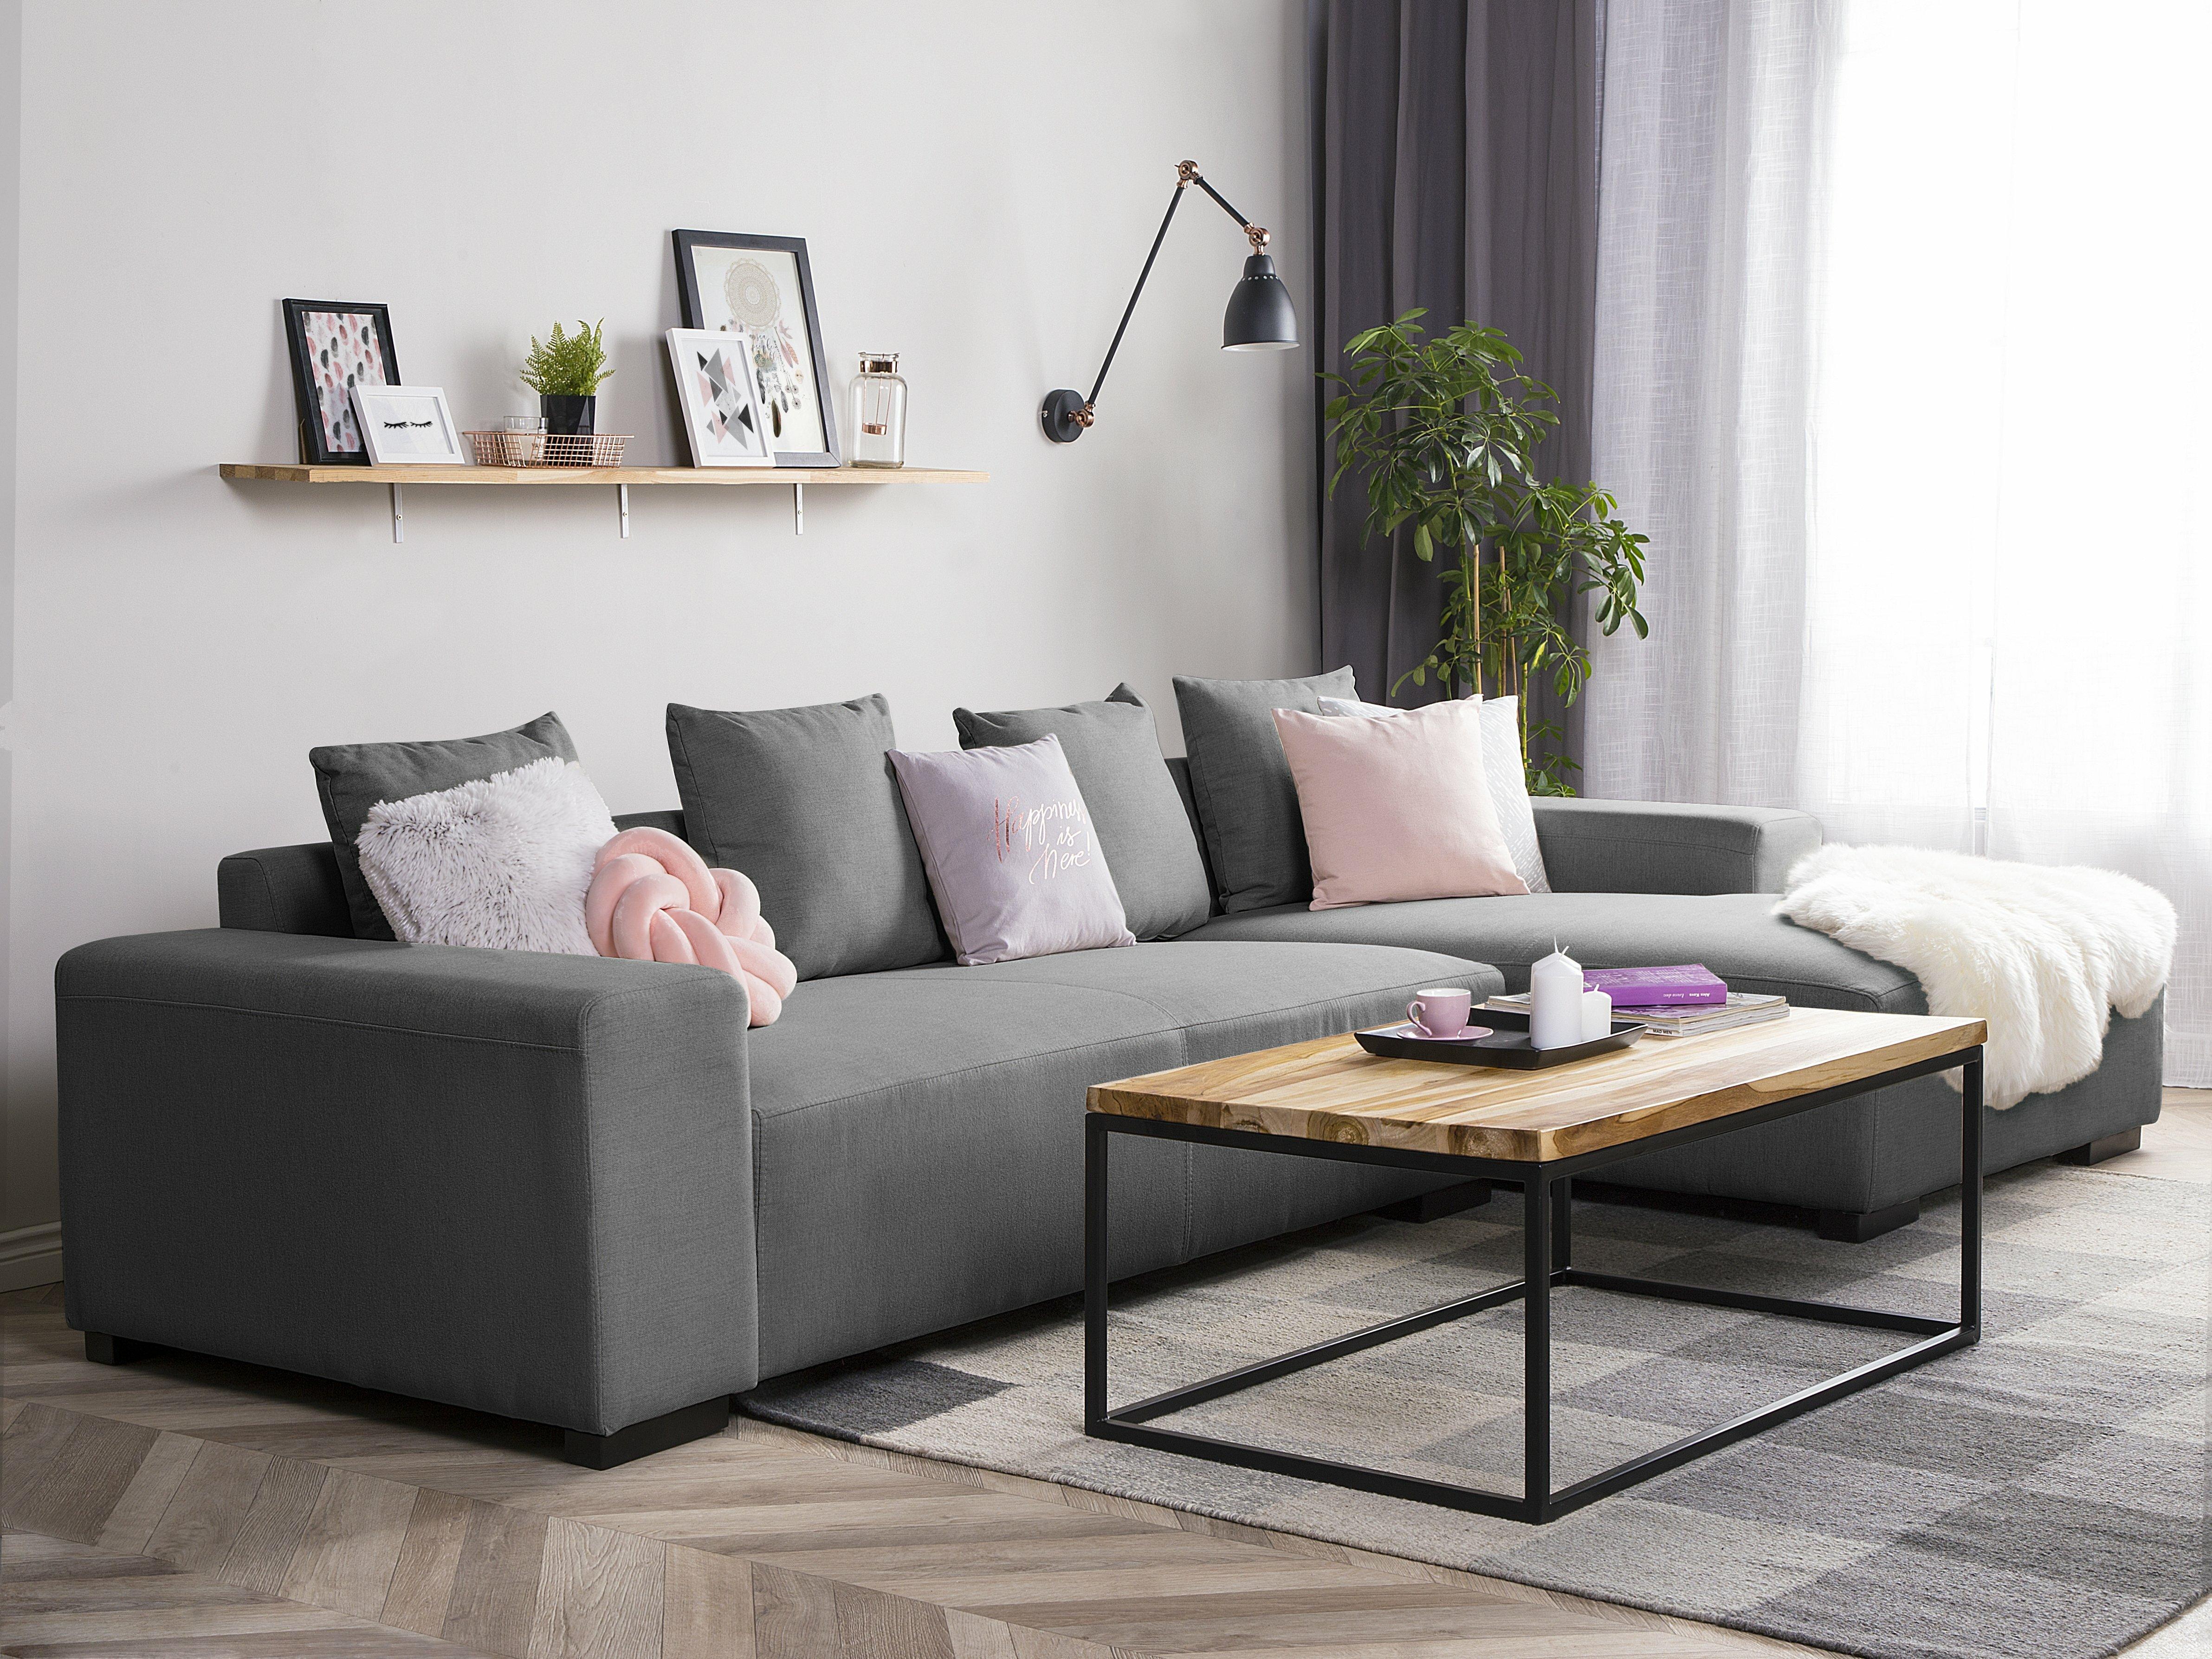 Phenomenal Callista Right Hand Facing Sectional Ibusinesslaw Wood Chair Design Ideas Ibusinesslaworg